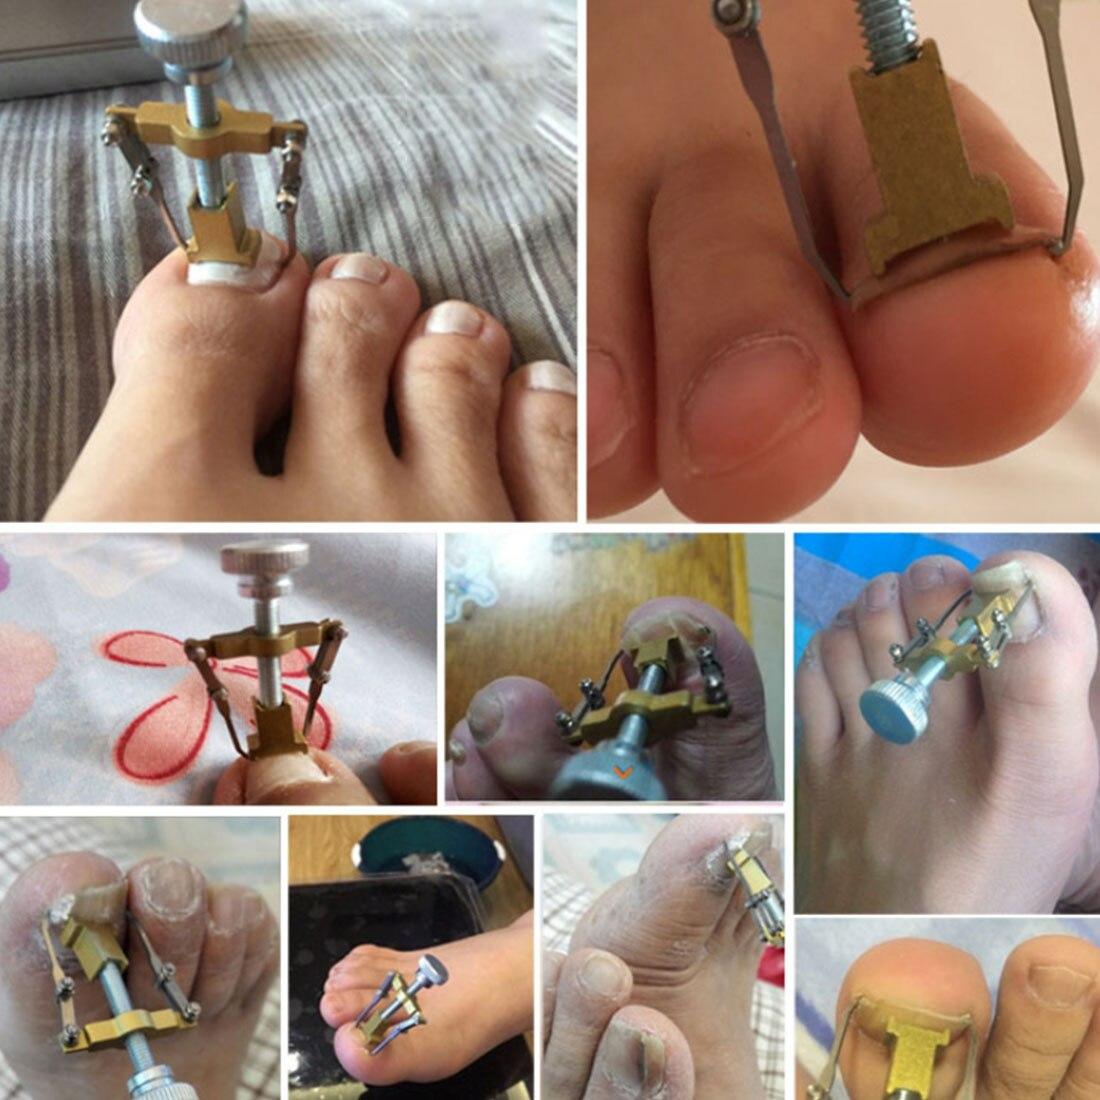 IngrownToe/Nail Correction Tool Fixer Recover/Curvy NailcurlerToe Paronychia /Nail Brace Tools Ingrown Toenails Pedicure Tool